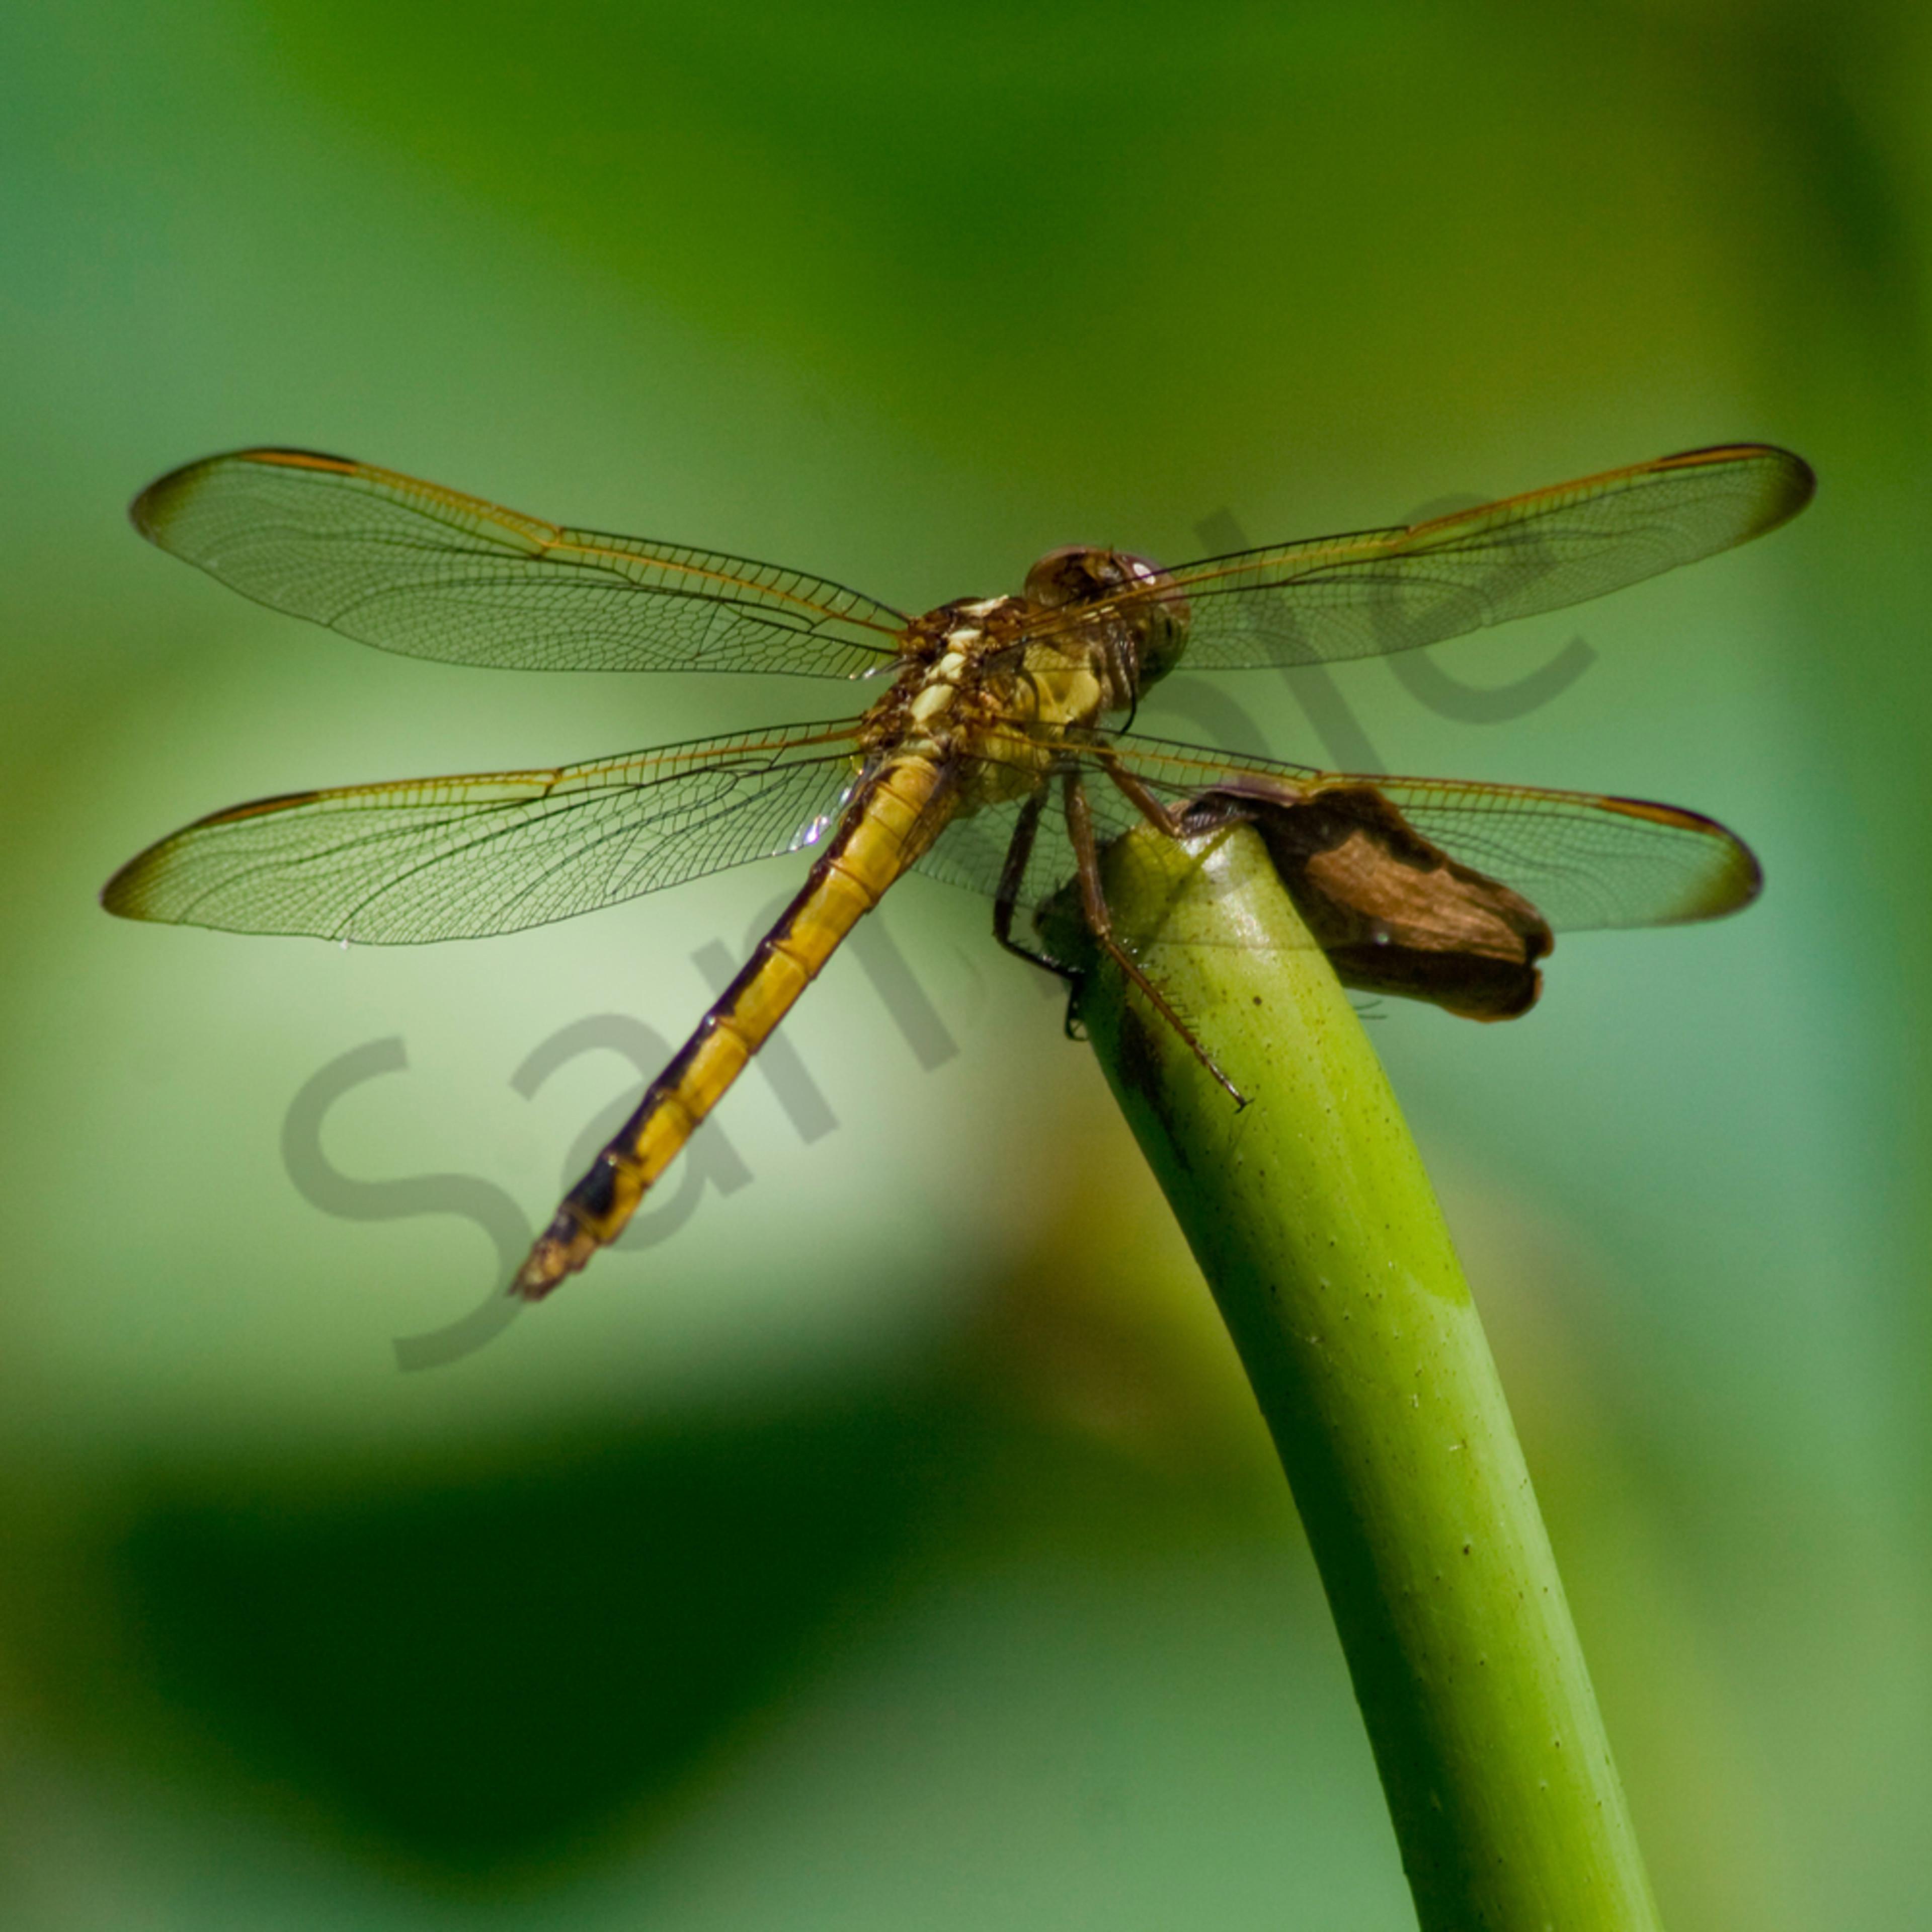 X translucent wings po5b6p